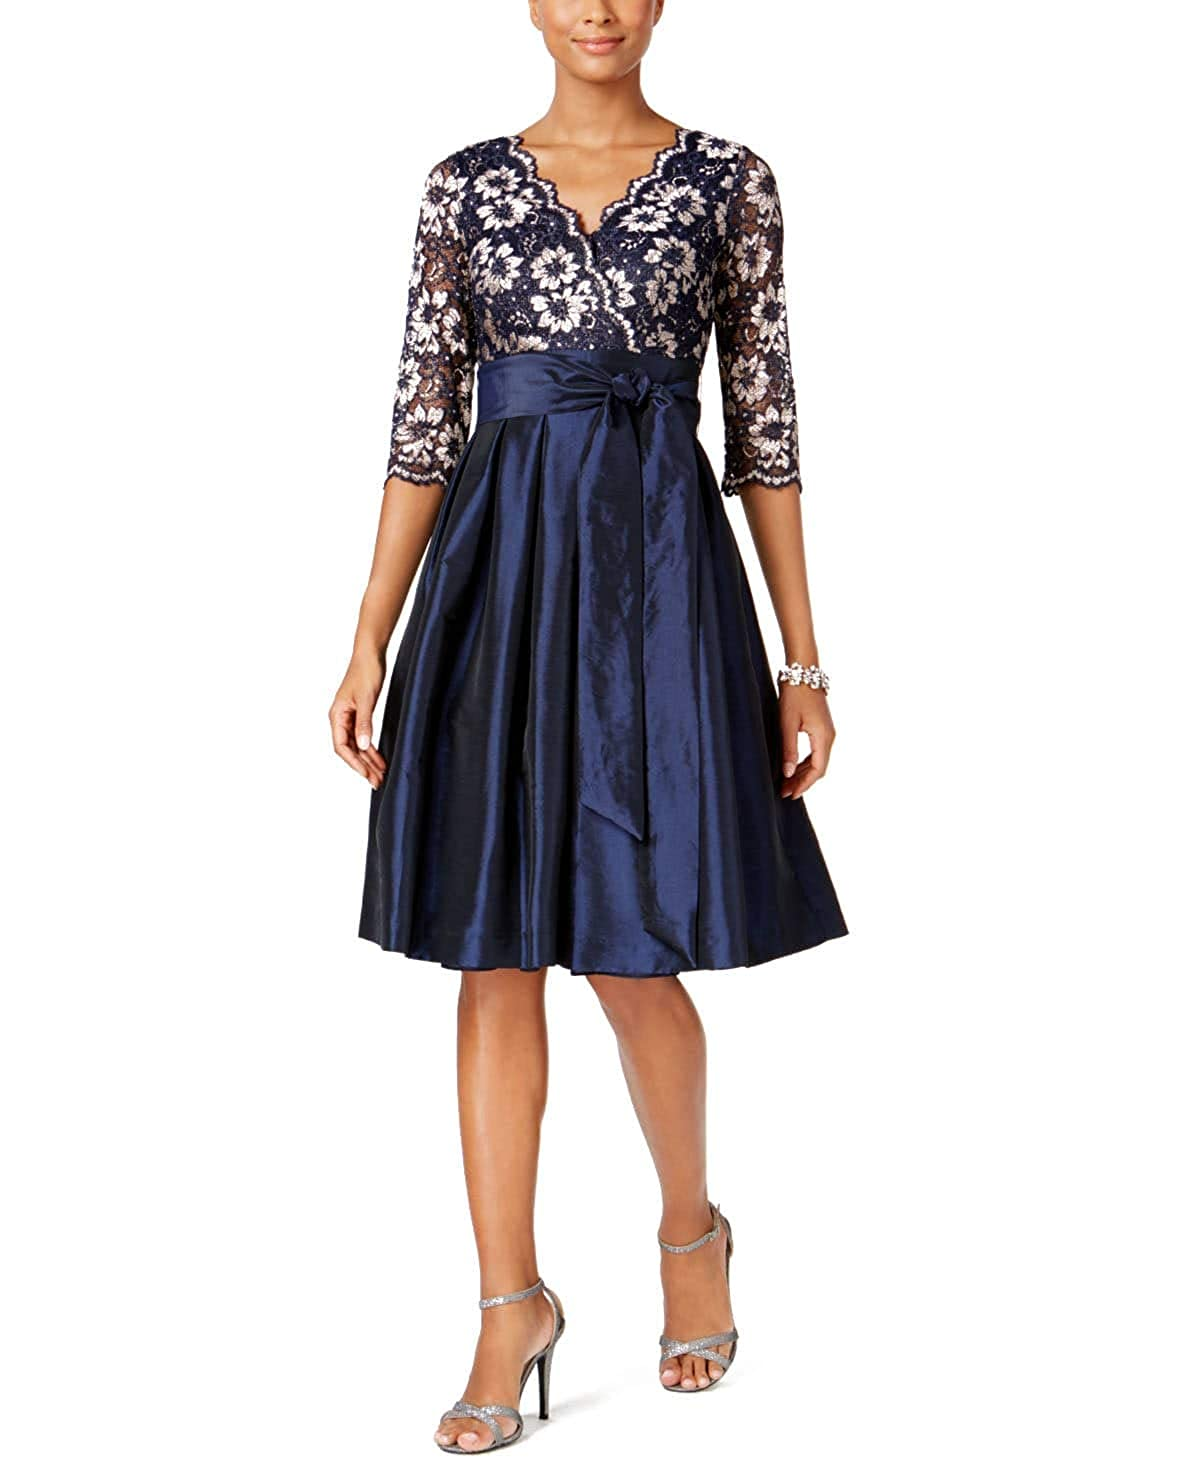 f6270165f06b7 Jessica Howard Womens Lace Taffeta Fit & Flare Dress Navy/Tan 12 at Amazon  Women's Clothing store: